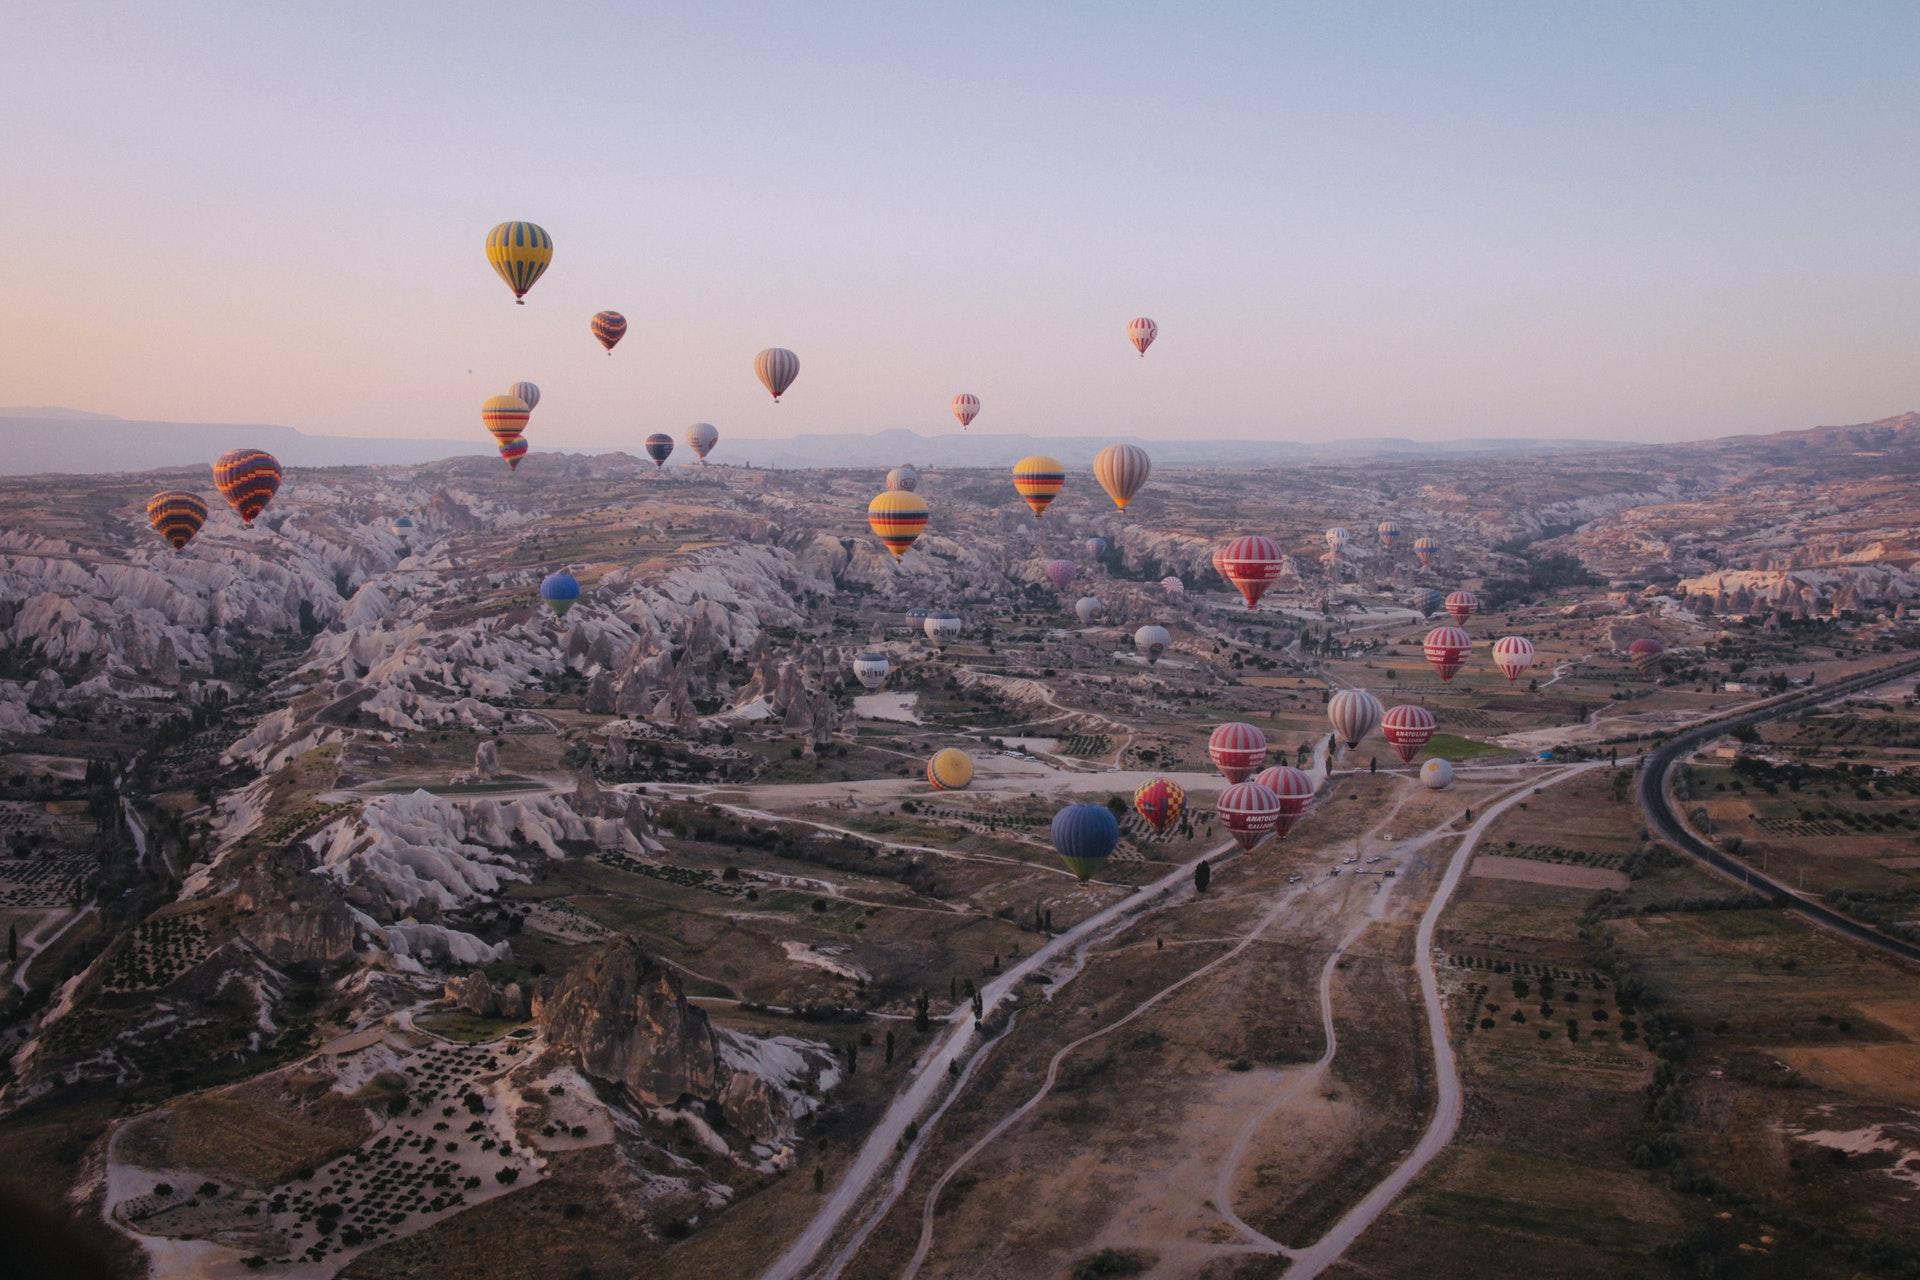 Hot Balloons in Turkey, a good travel activity